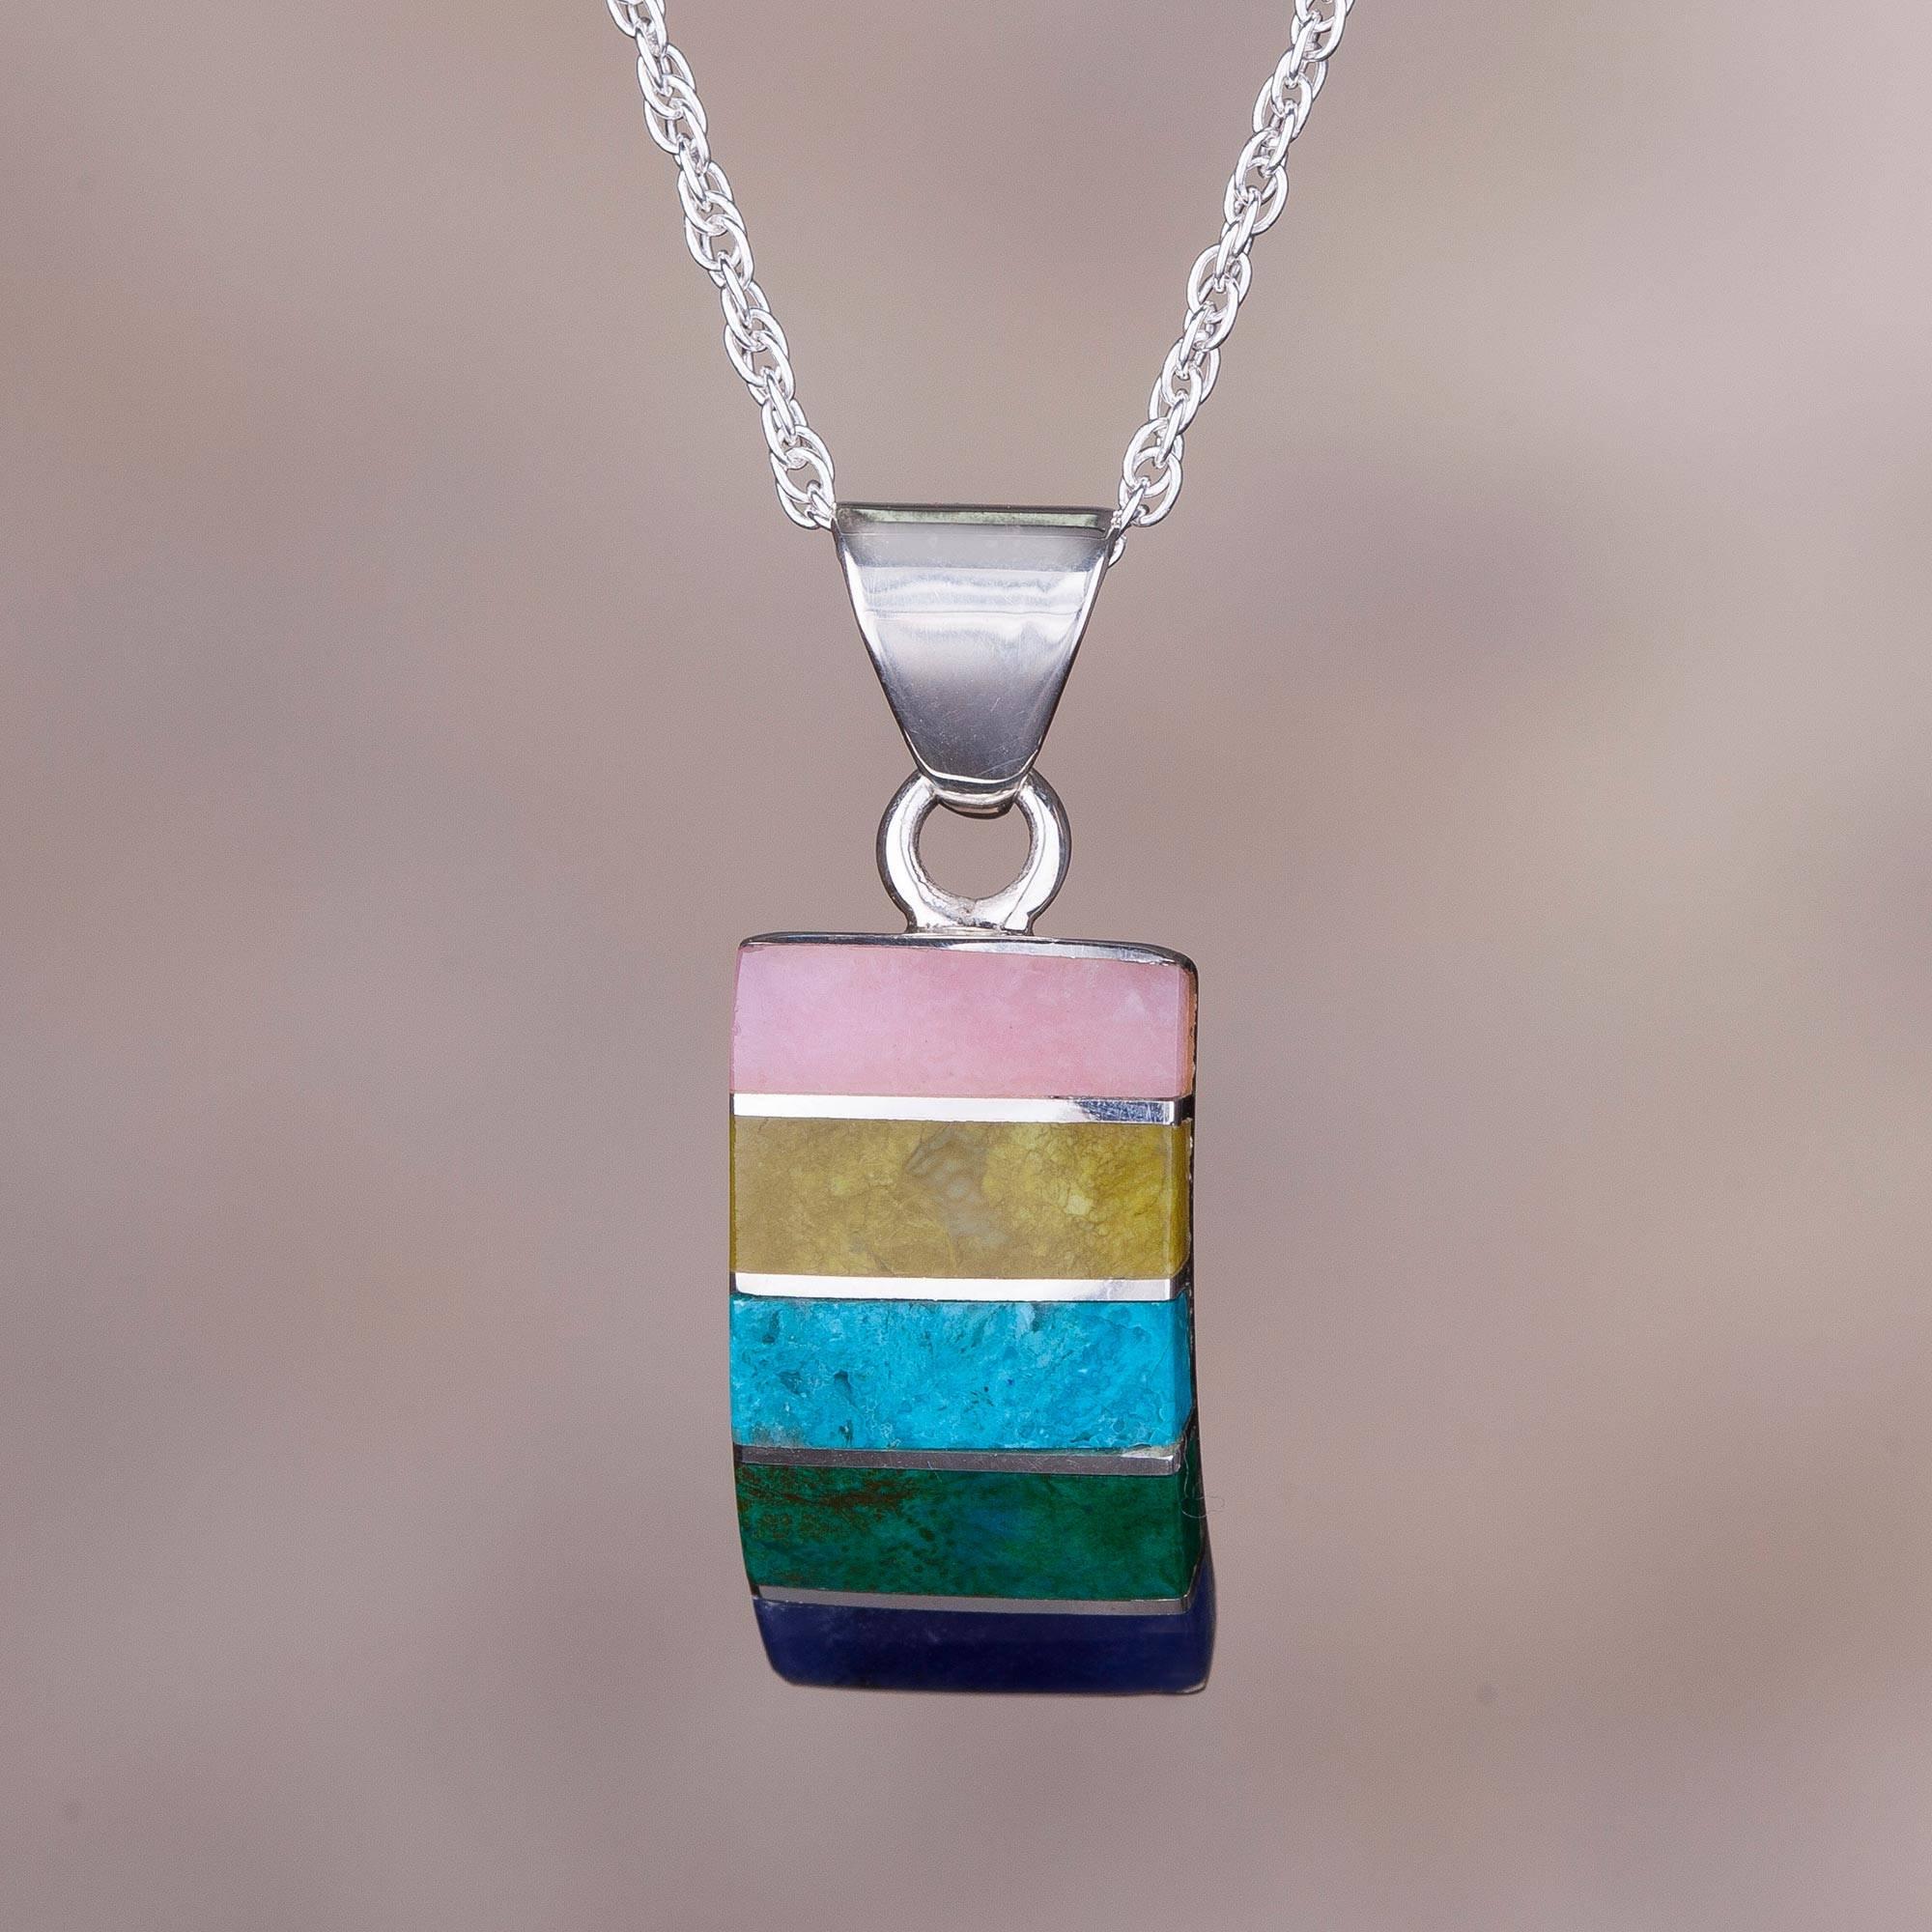 Oceanic Colors Colorful Multi-Gemstone Pendant Necklace